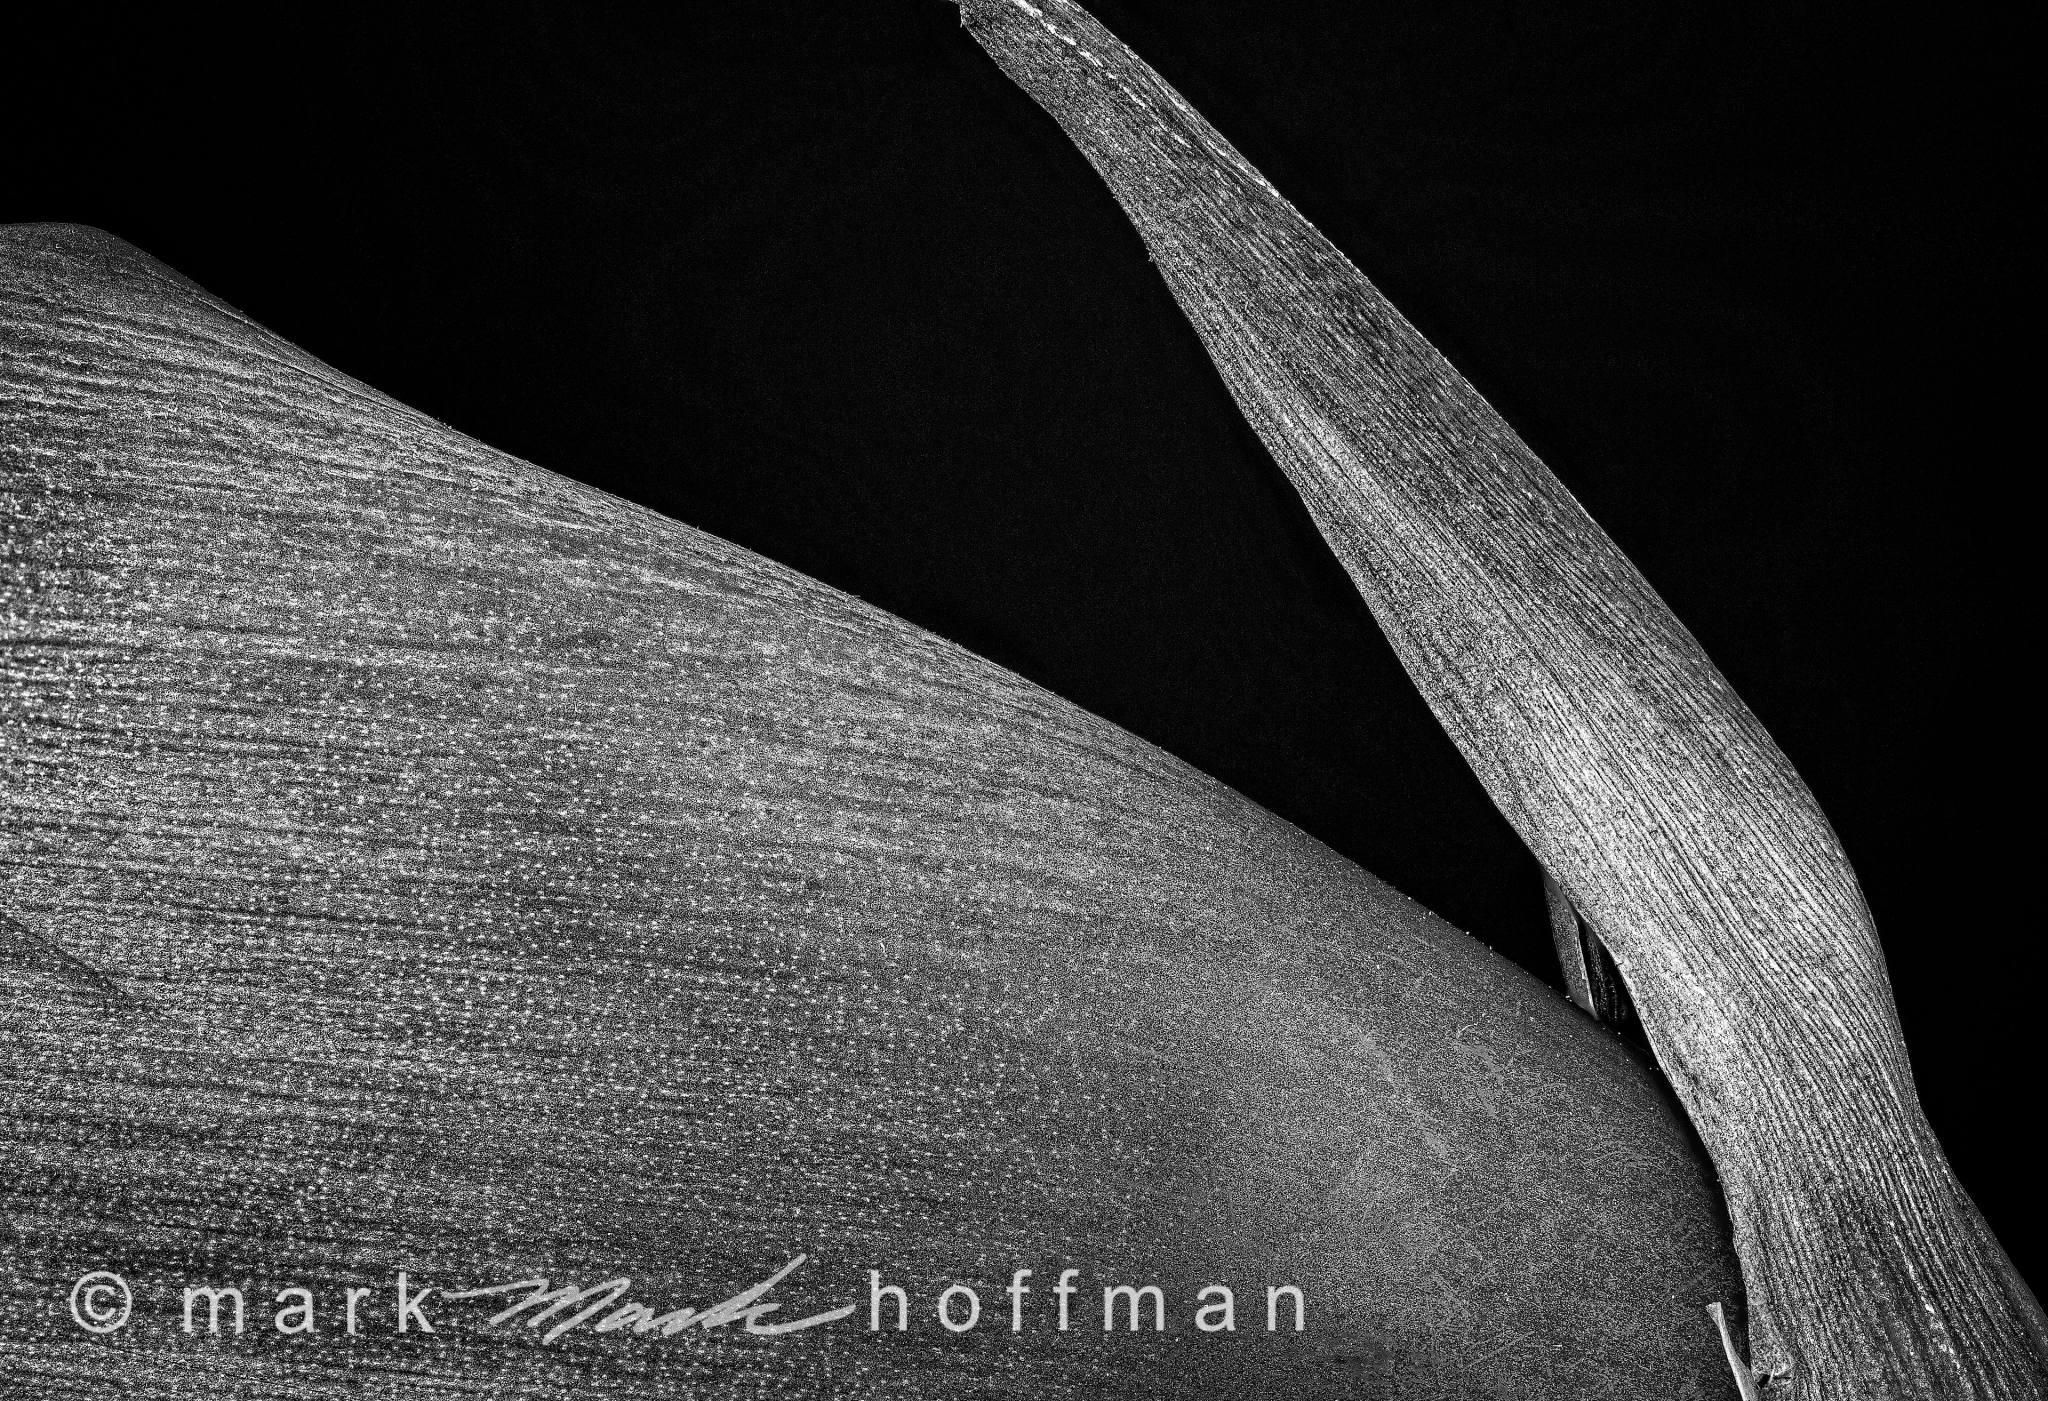 Mark_Hoffman_photophart_20150217_0394to0413_ZSretDM_PSD_2_Psiz_PBW_cap1_var1.jpg